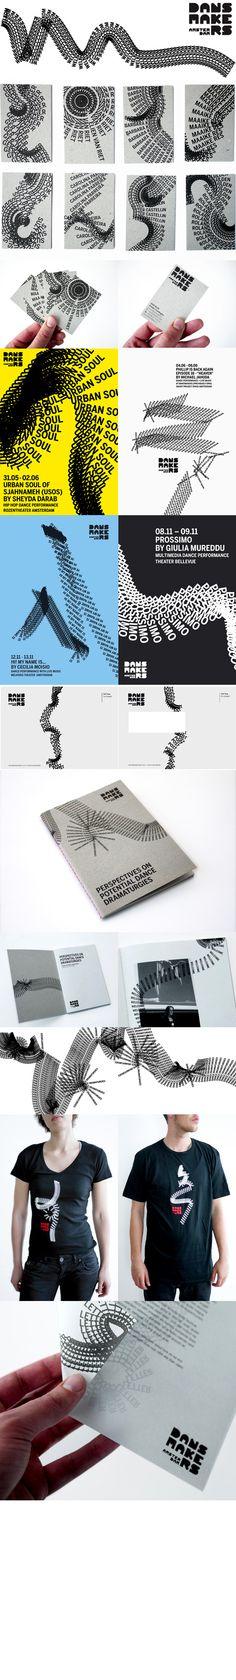 Dansmakers | Lava Graphic Design, Amsterdam